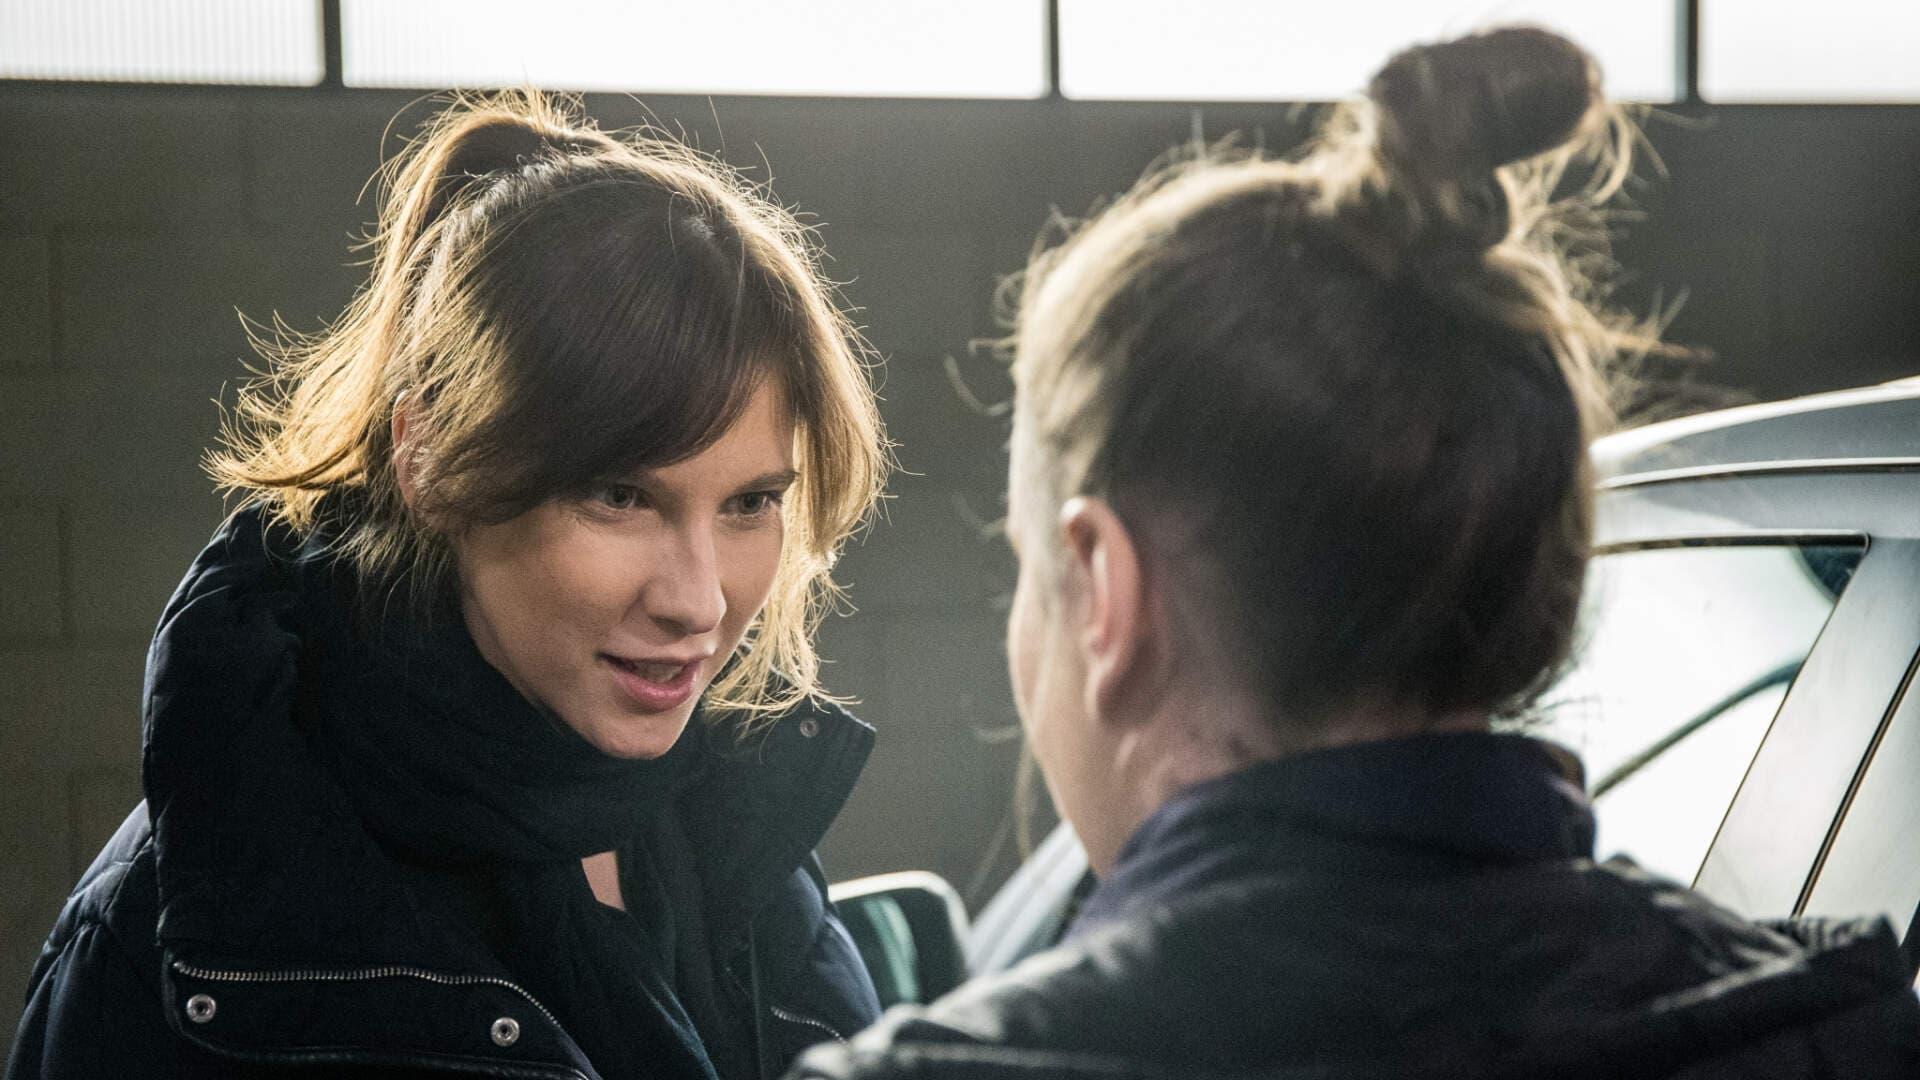 Zakochani po uszy - Season 5 Episode 55 : Episode 55